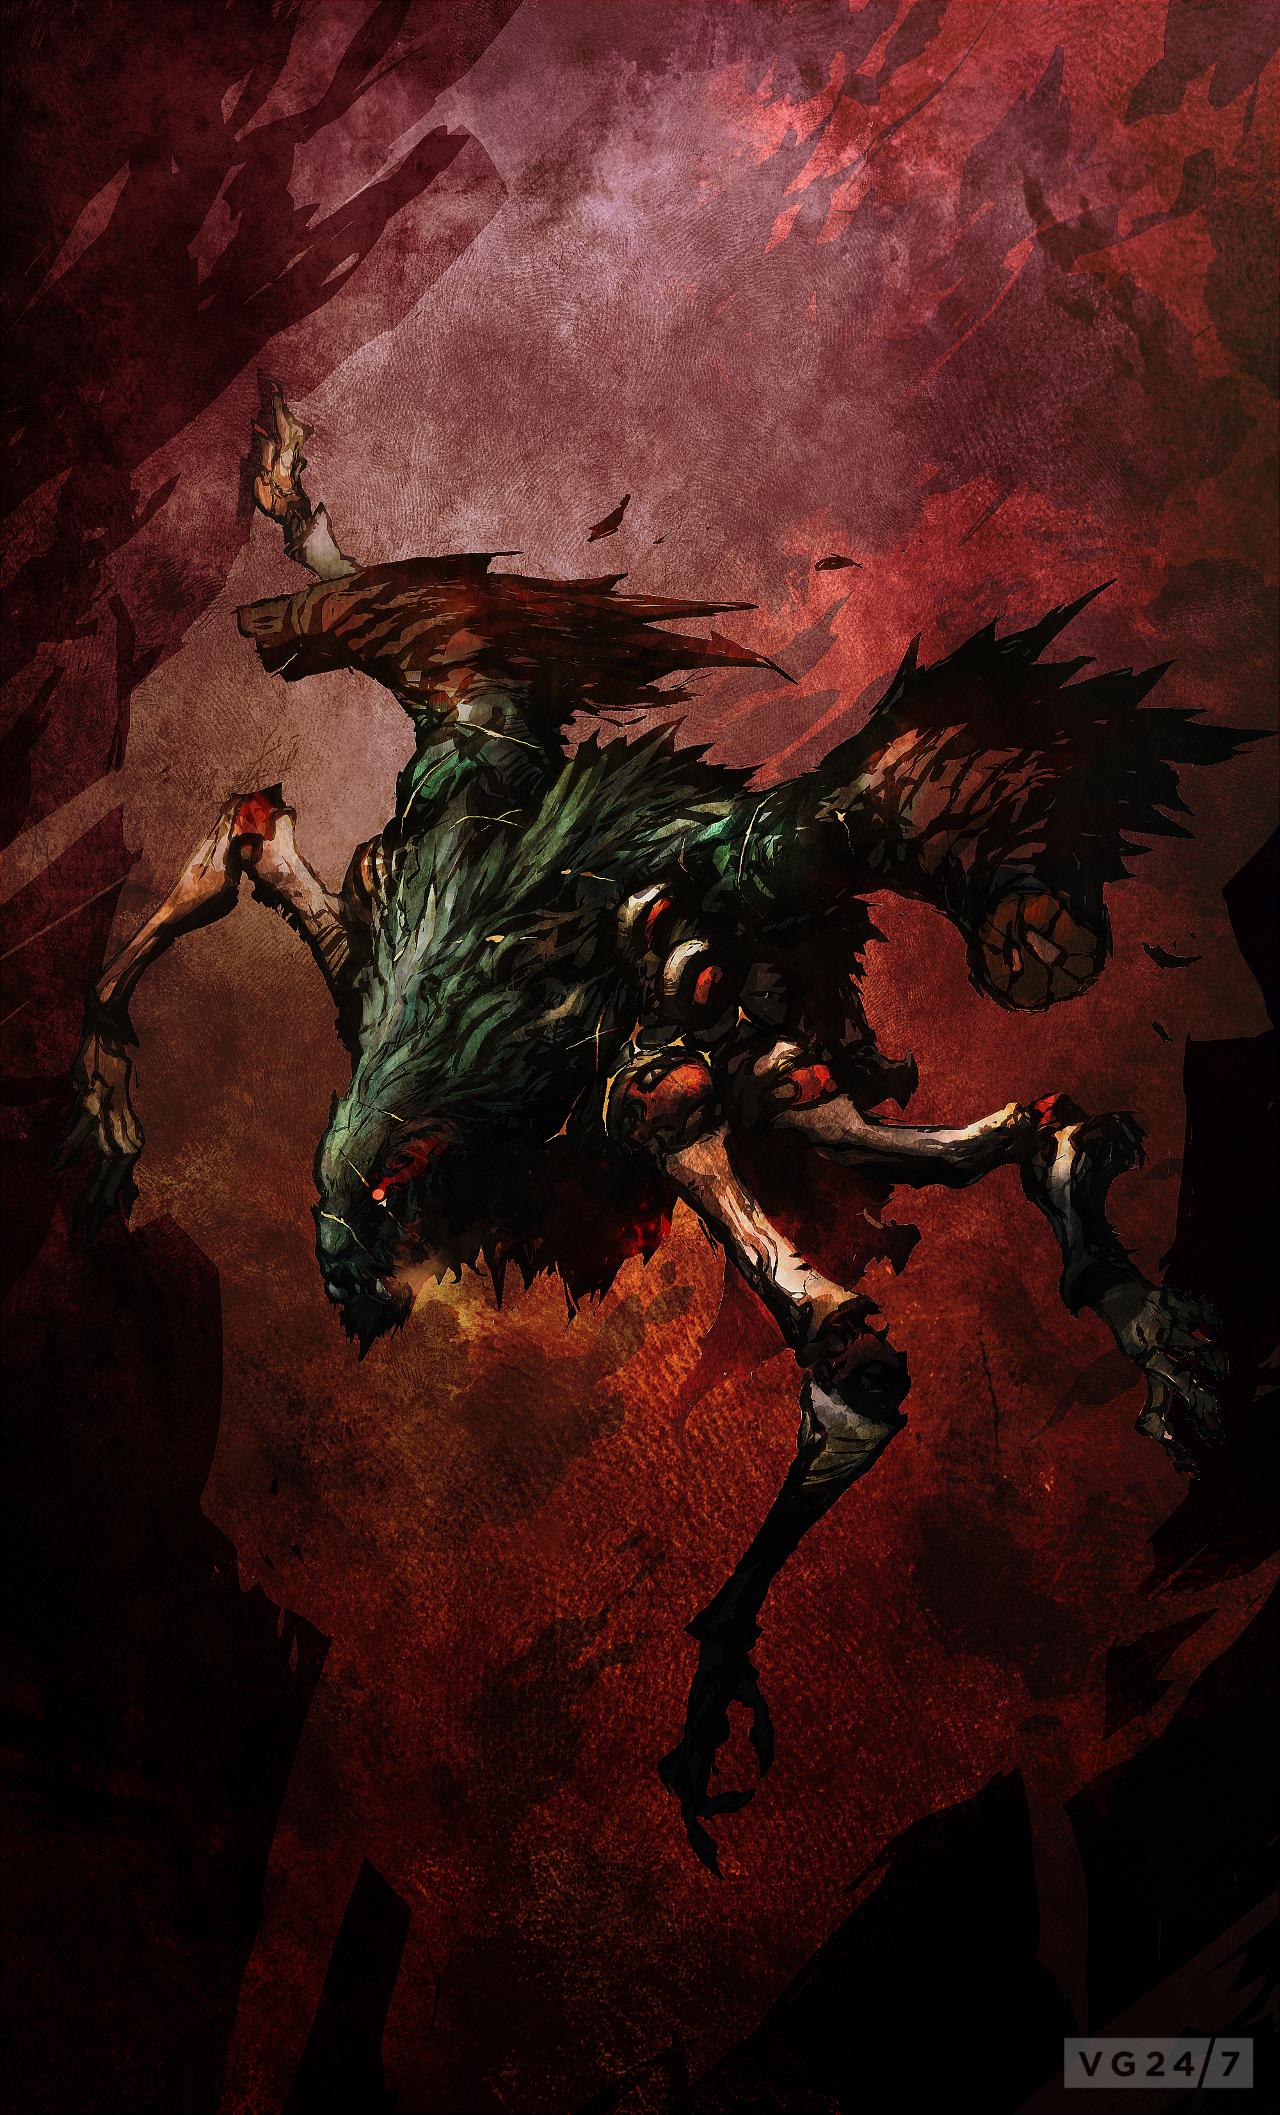 Castlevania Mirror Of Fate New Screens Amp Art Show Combat